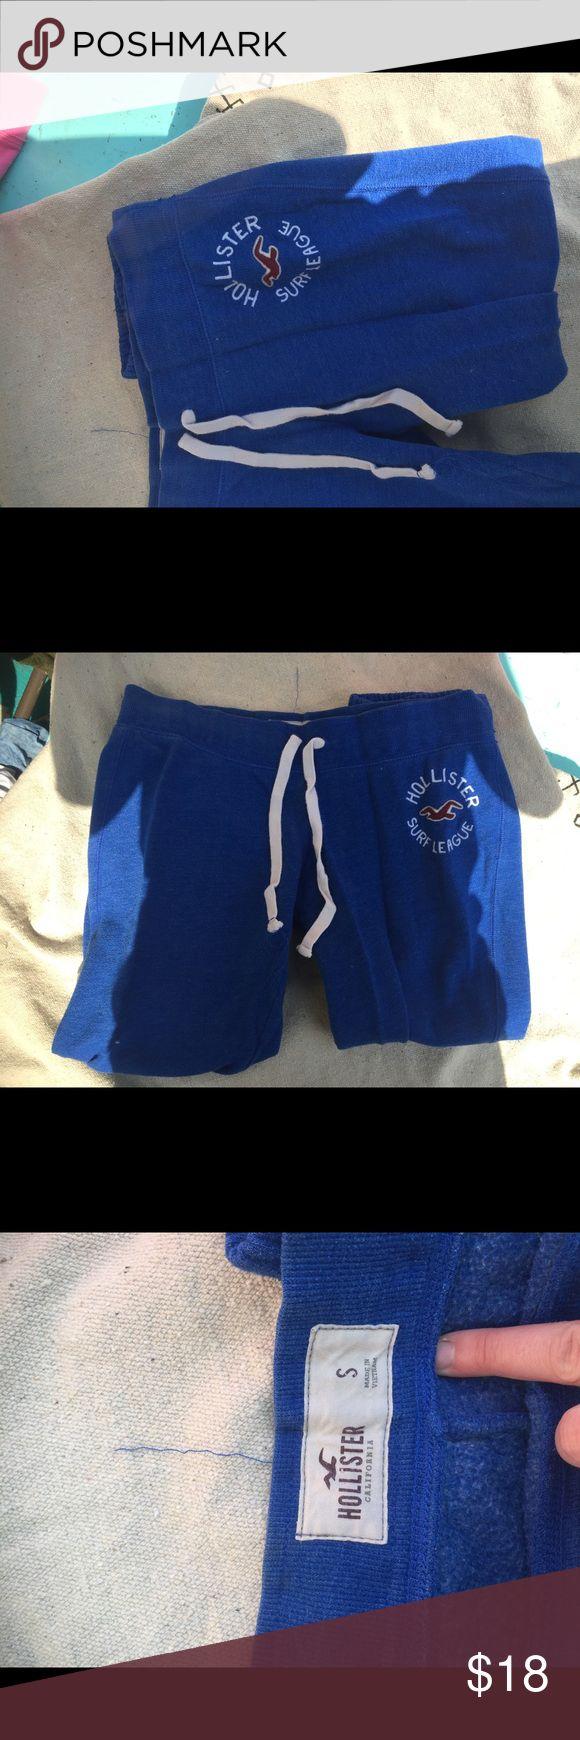 Hollister blue sweatpants Blue hollister sweatpants cropped bottoms with adjustable waist Hollister Pants Track Pants & Joggers